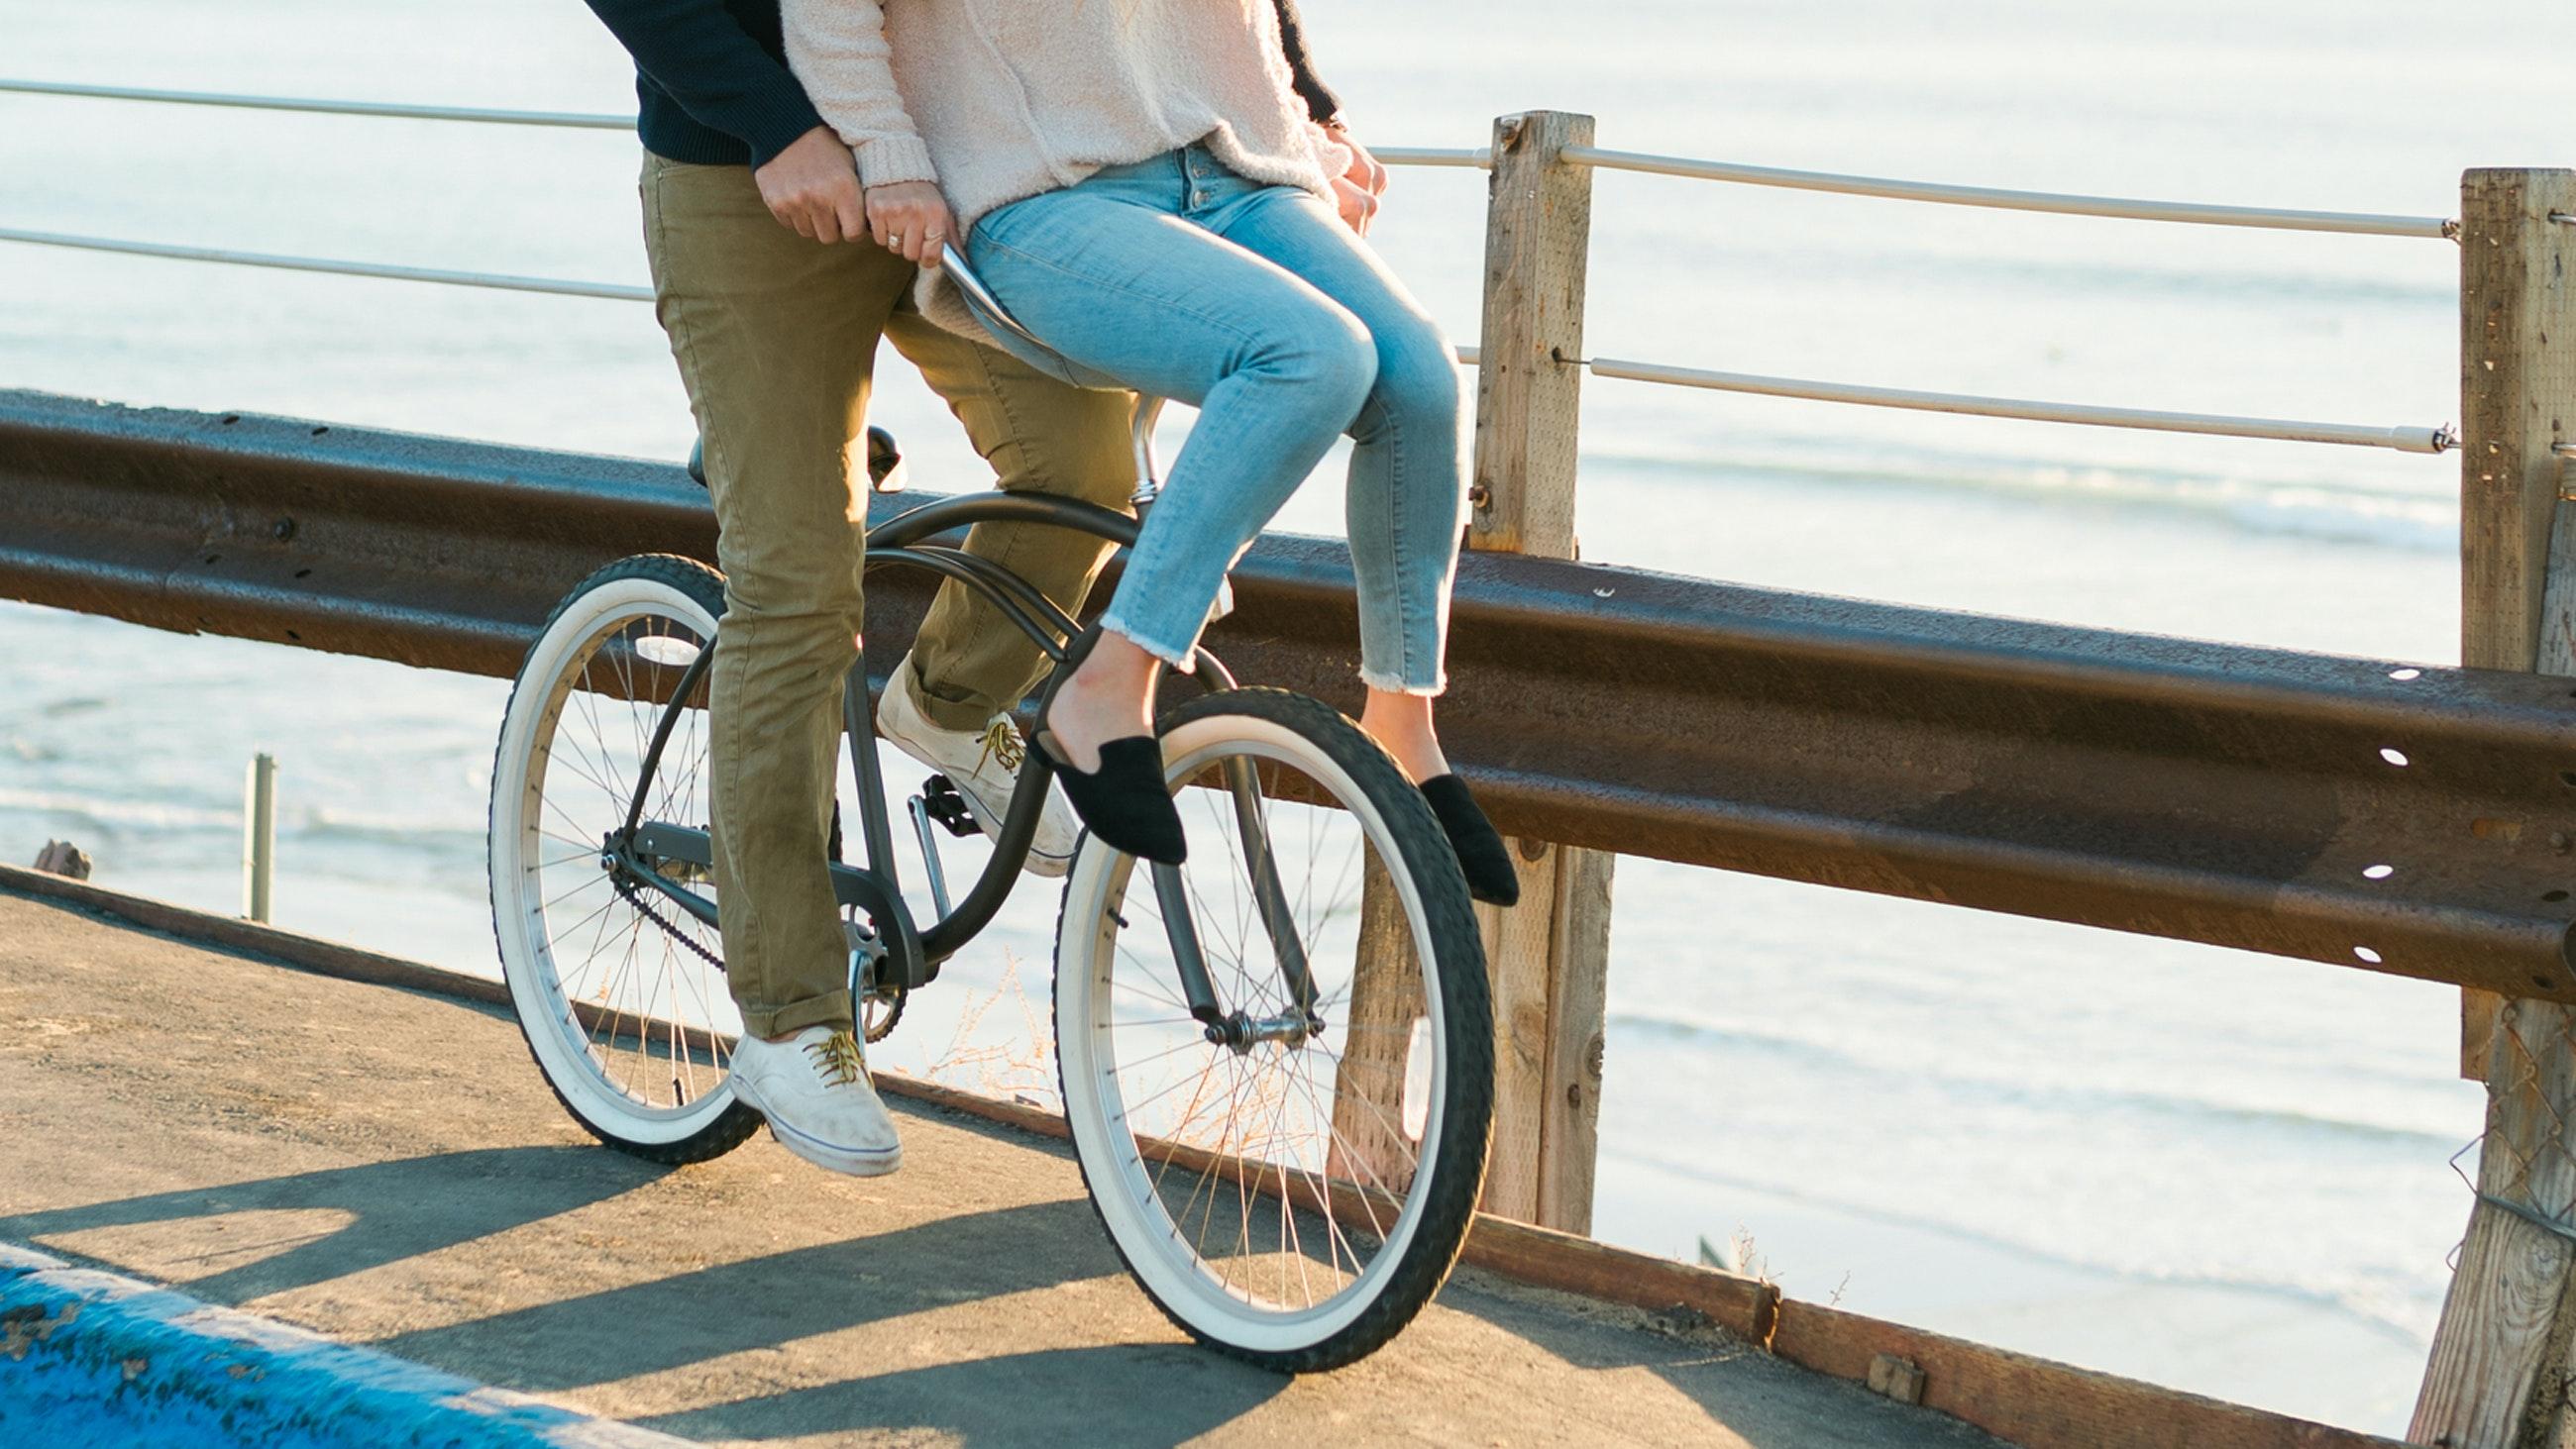 date night couple riding a bike